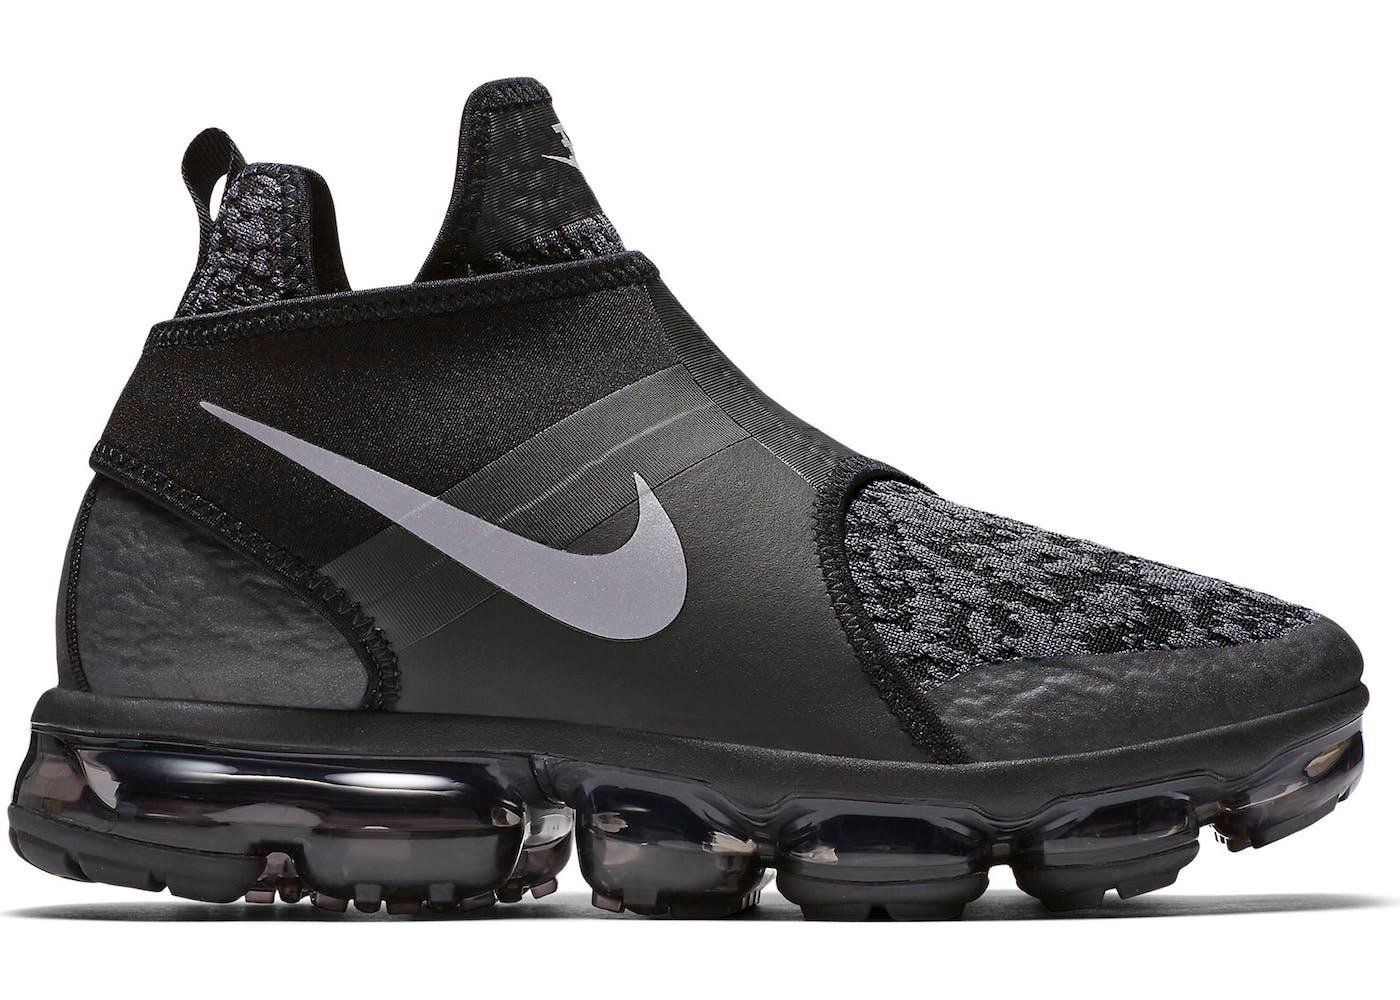 Nike Vapormax Silver